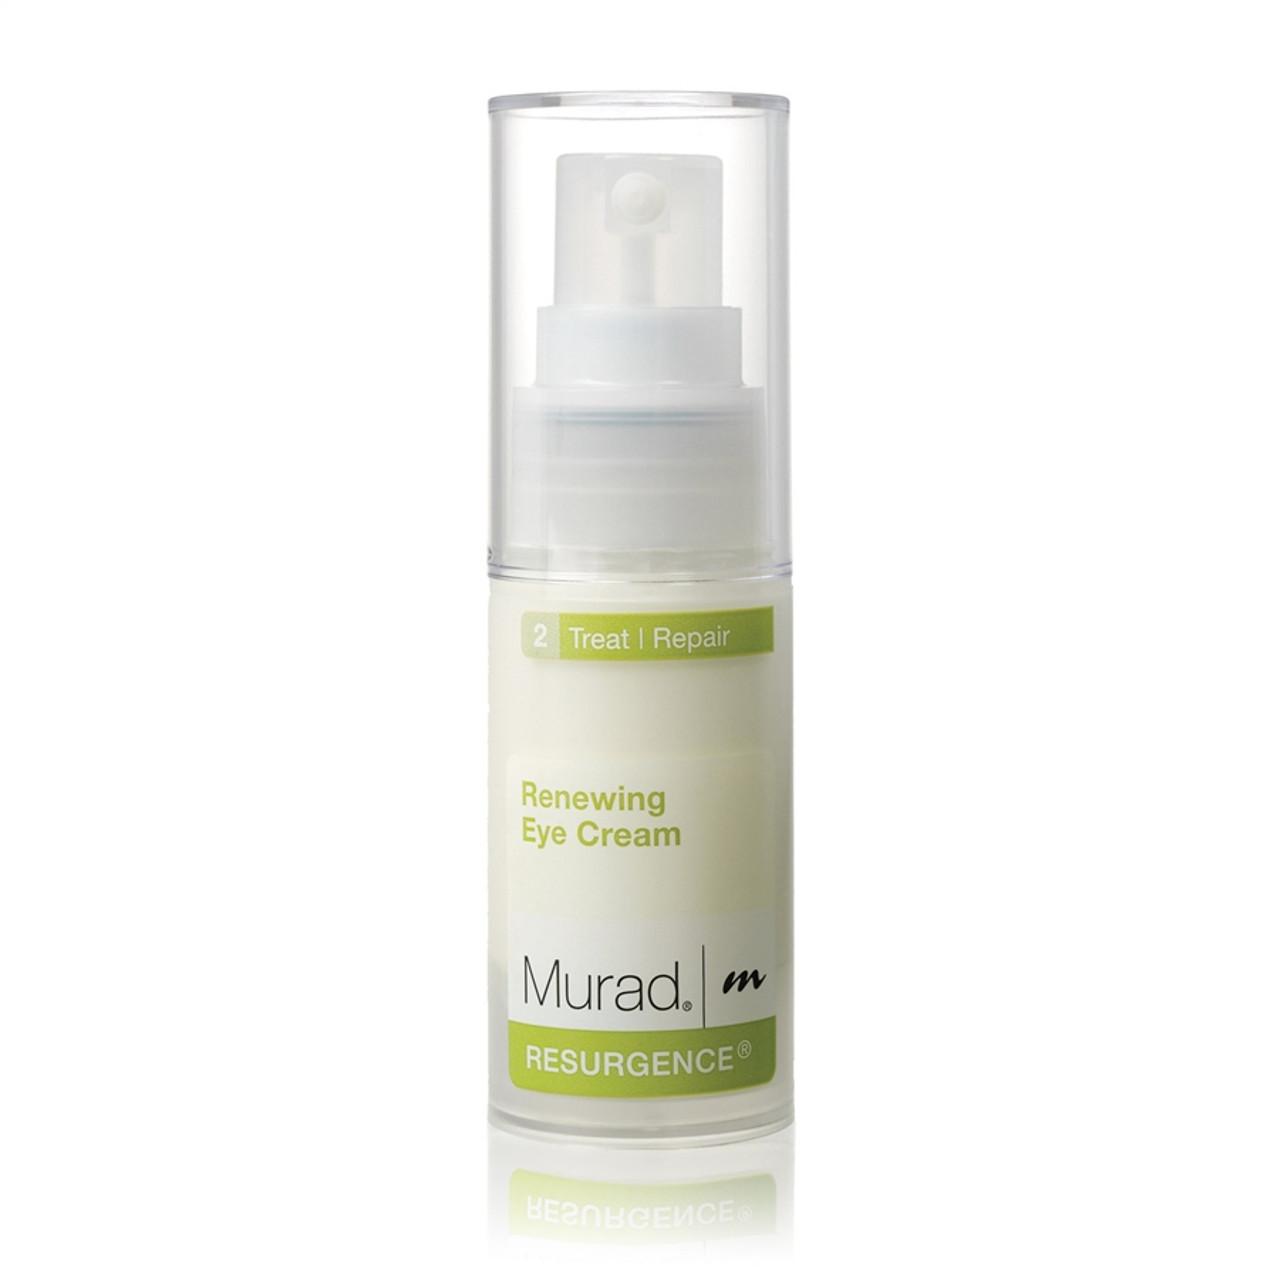 Murad Renewing Eye Cream 0.5 oz